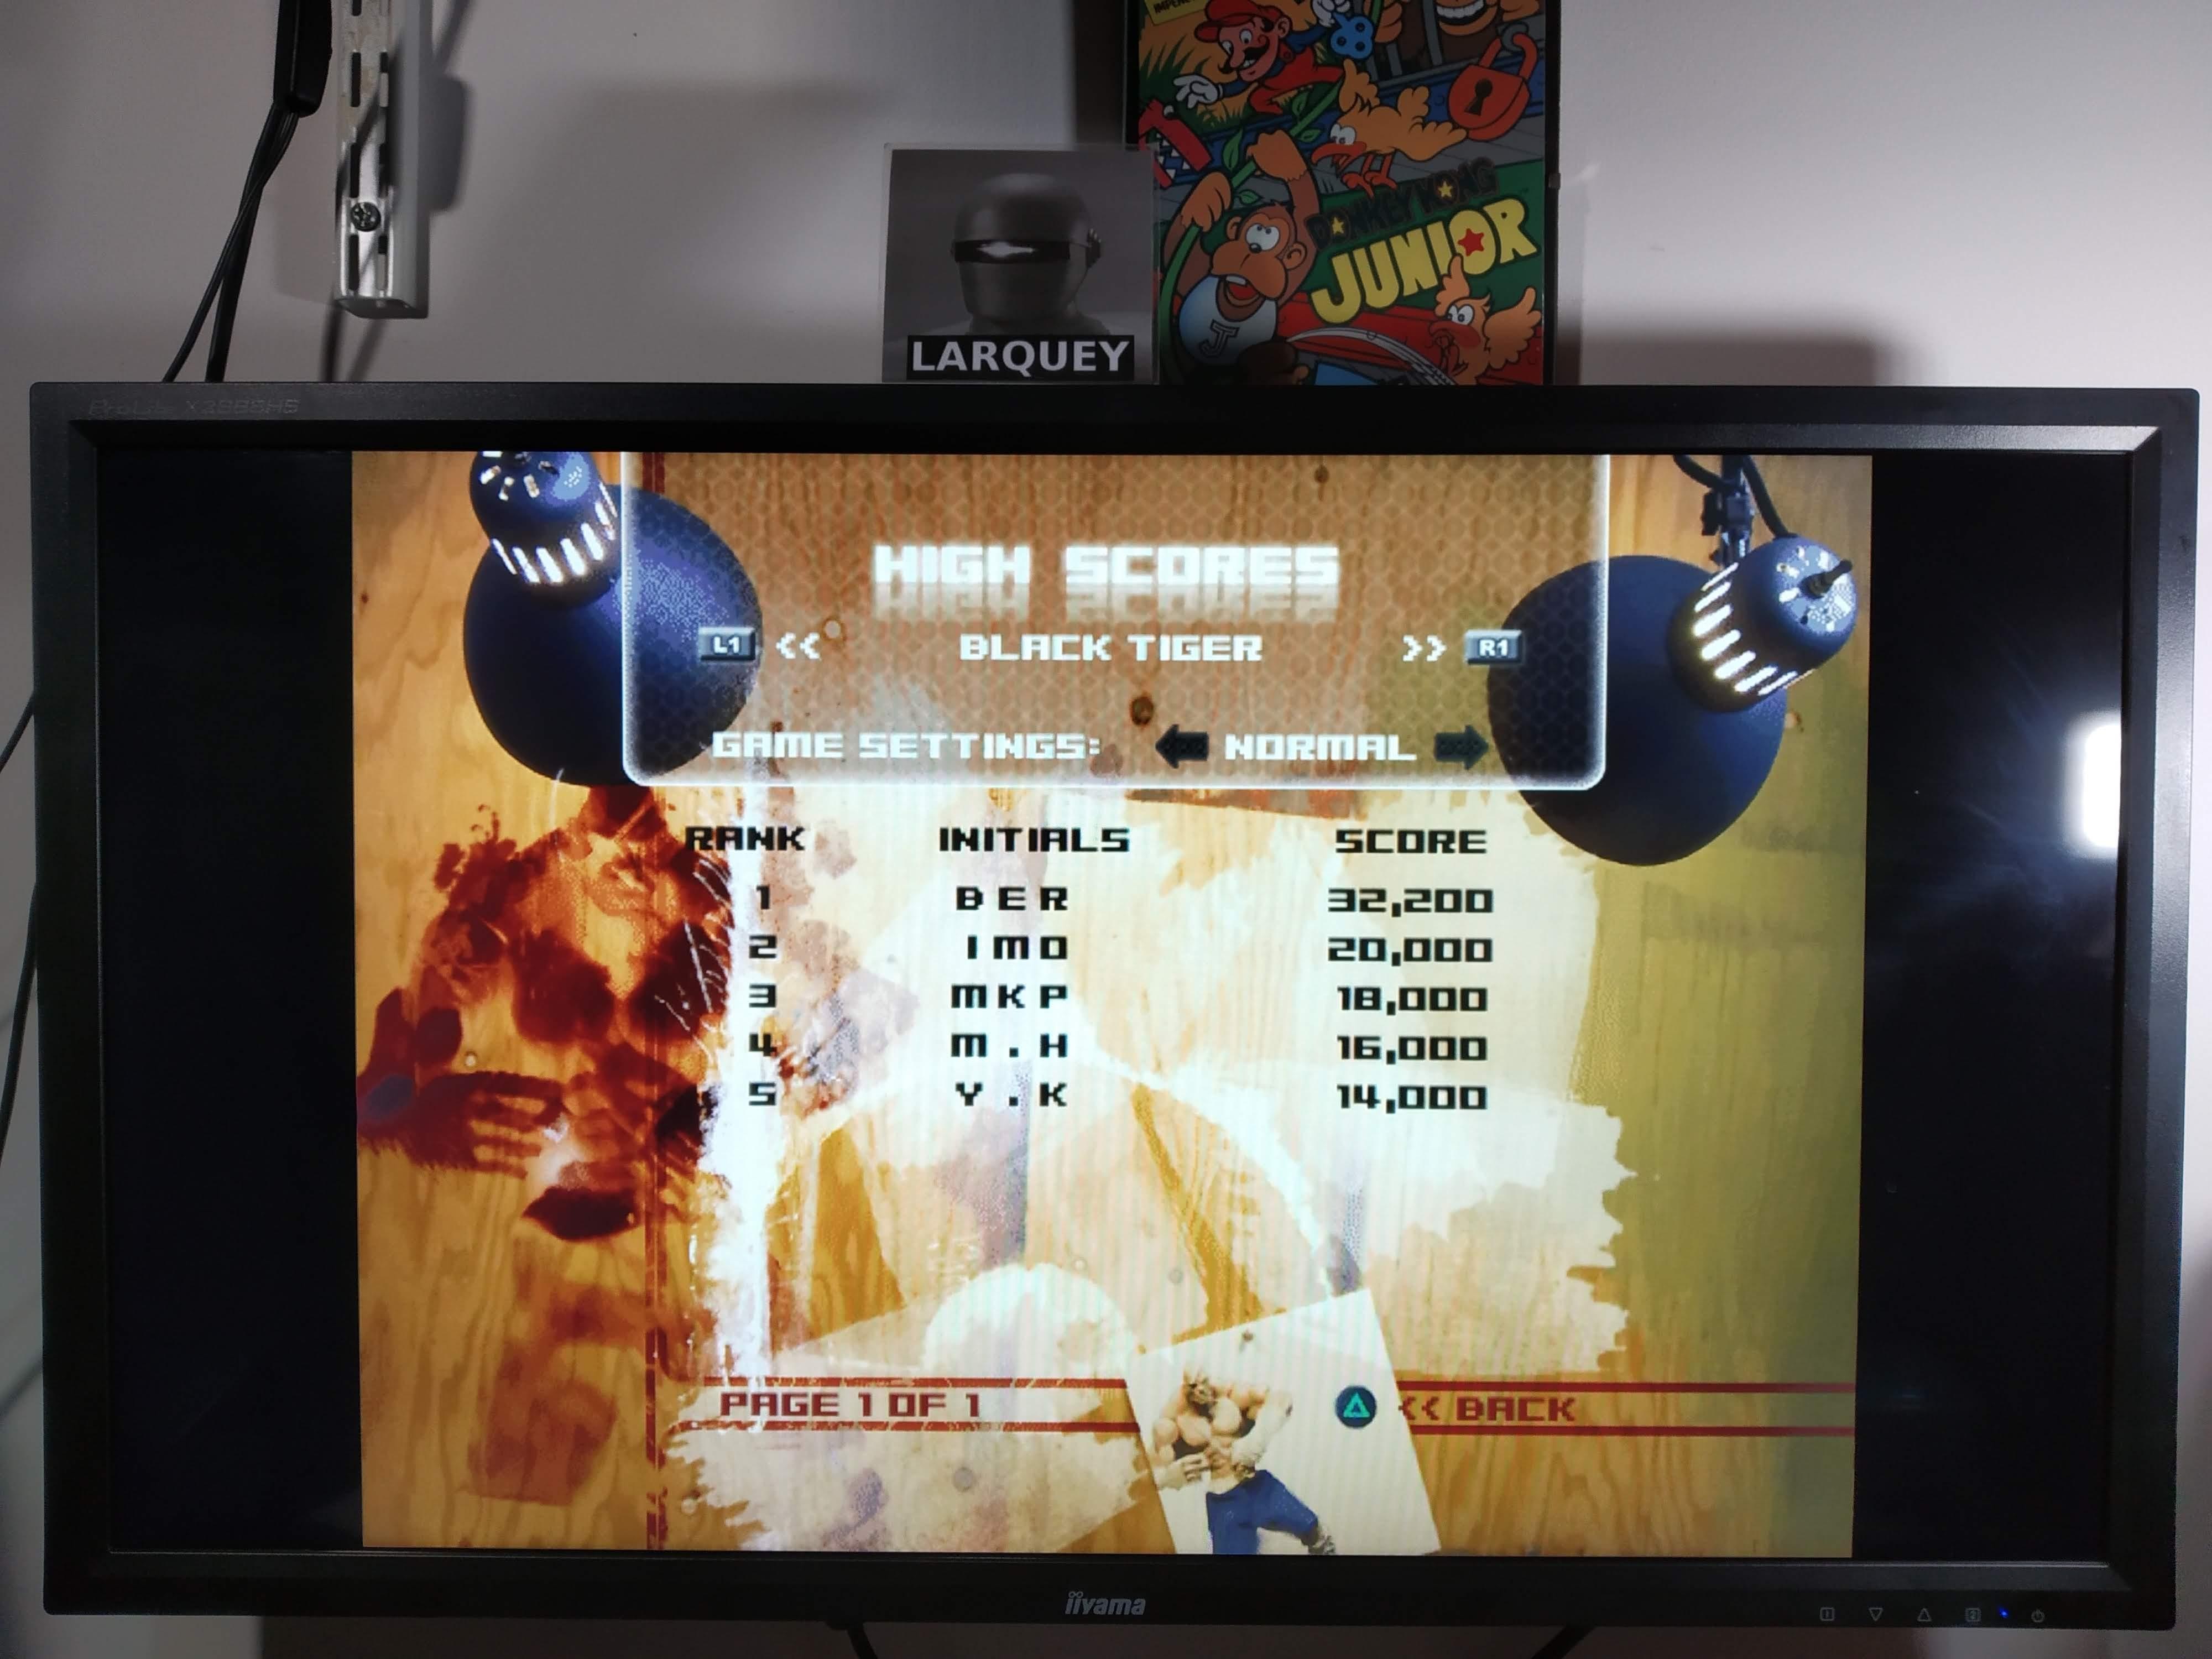 Larquey: Capcom Classics Vol 2: Black Tiger [Normal] (Playstation 2 Emulated) 32,200 points on 2020-08-01 11:20:54